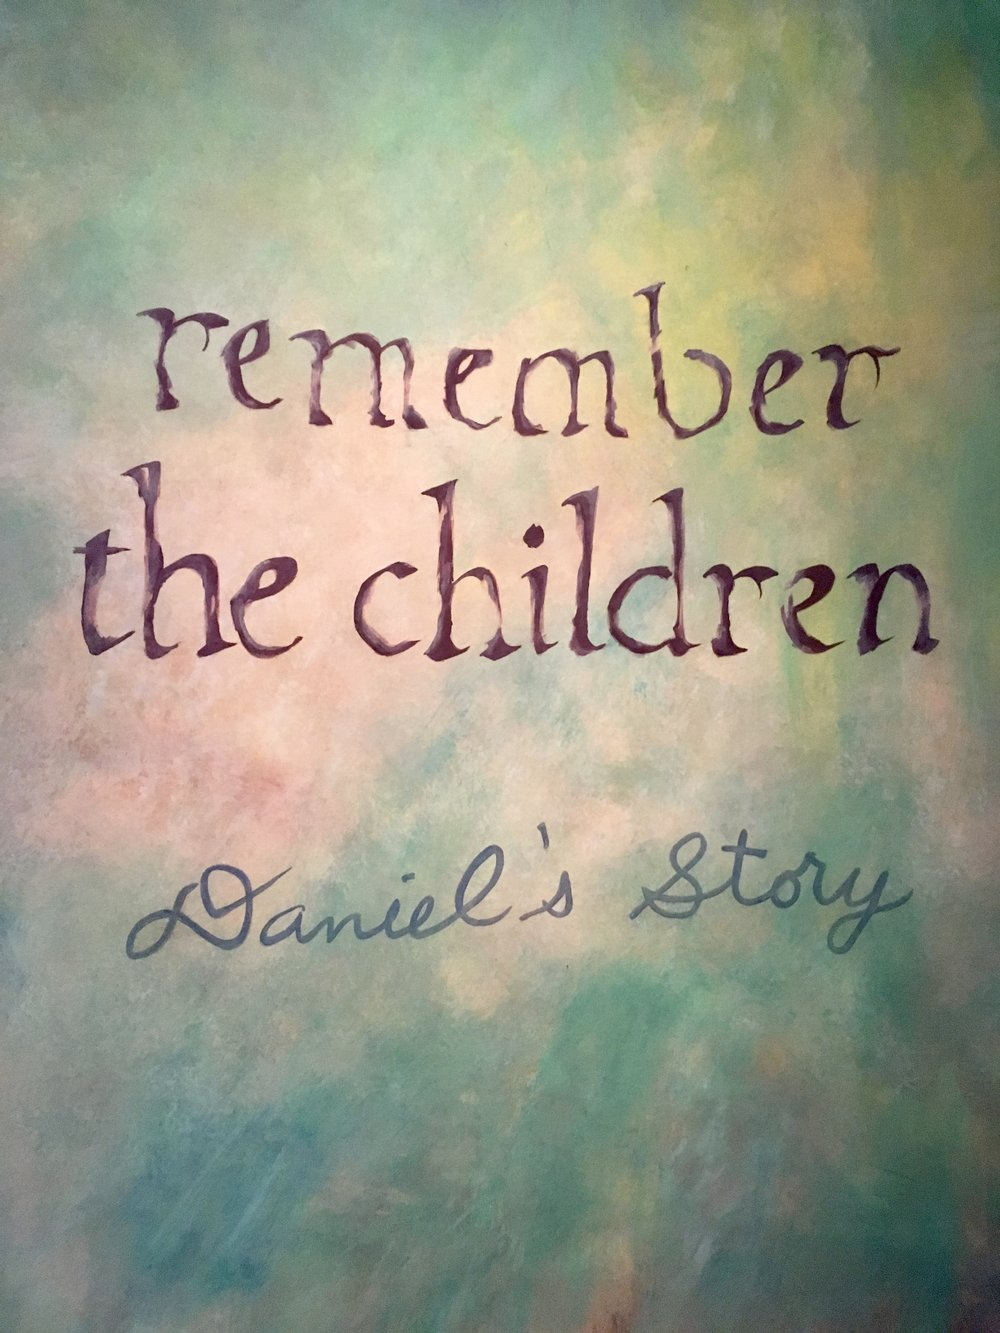 Daniel's Story Holocaust Museum Washington DC.  Free things to do in Washington DC